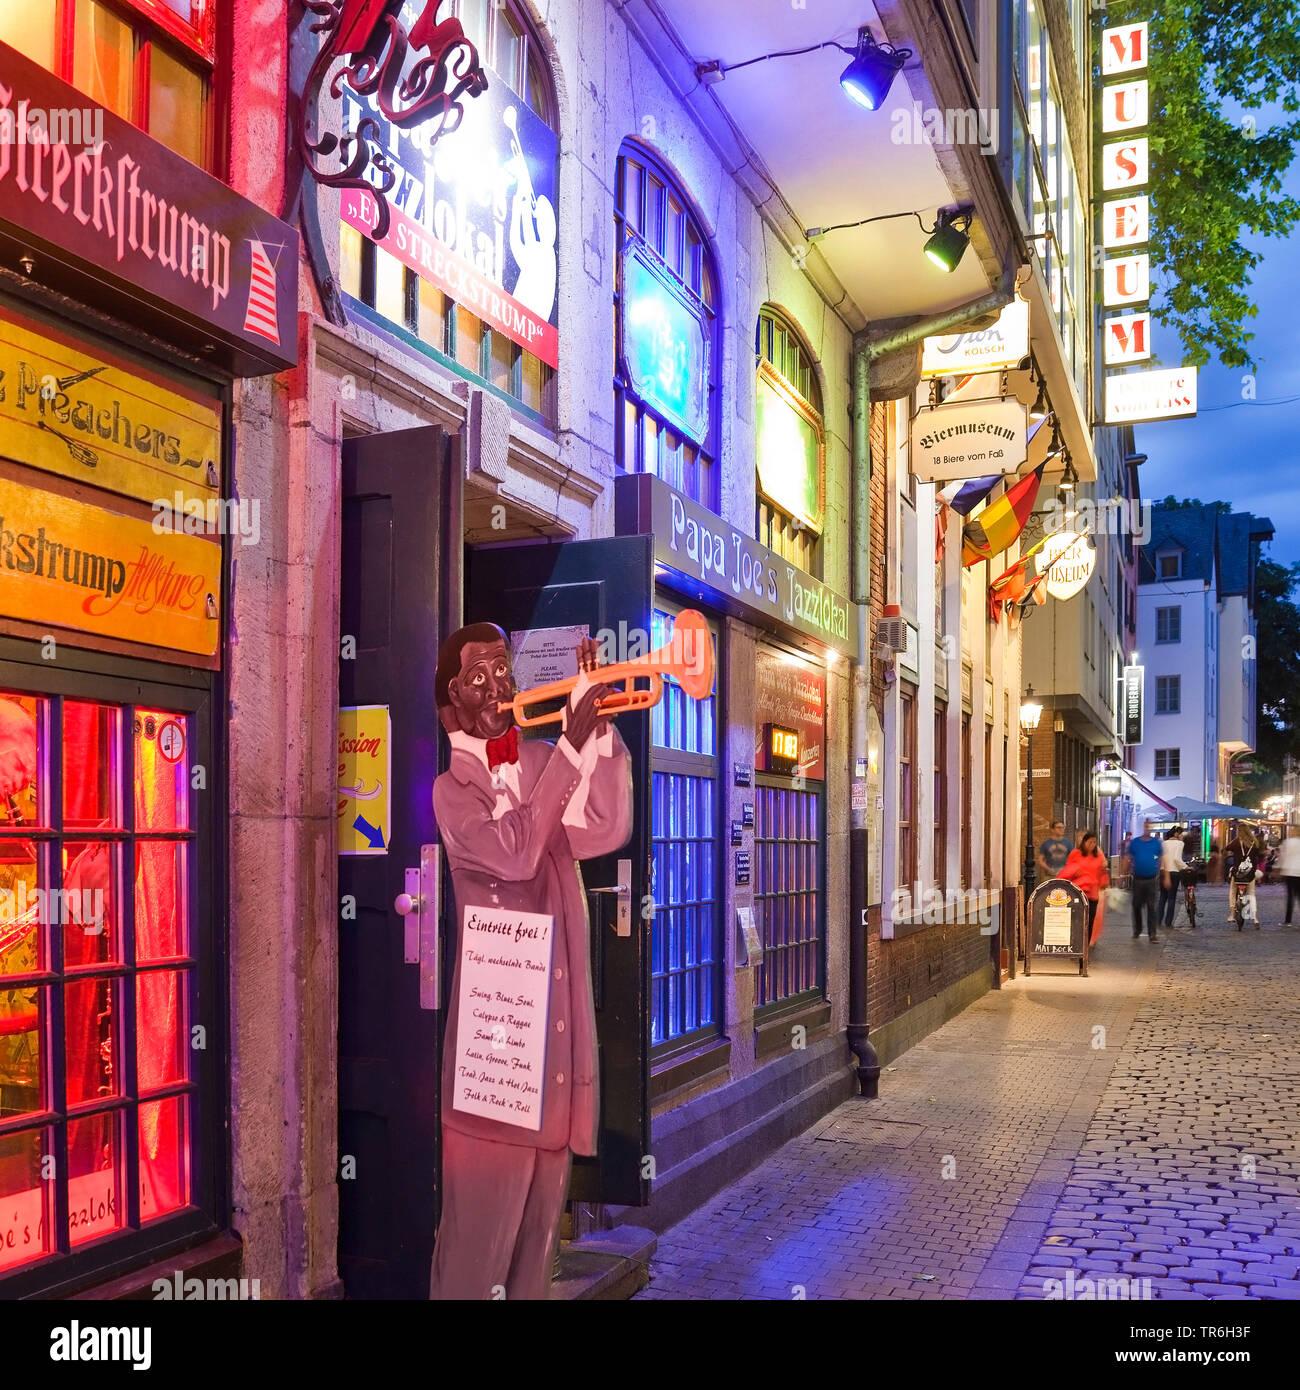 Papa Joe's Jazzlokal, Buttermarkt mit Biermuseum in der Koelner Altstadt, Deutschland, Nordrhein-Westfalen, Koeln | Papa Joe's Jazz Venue, Buttermarkt - Stock Image